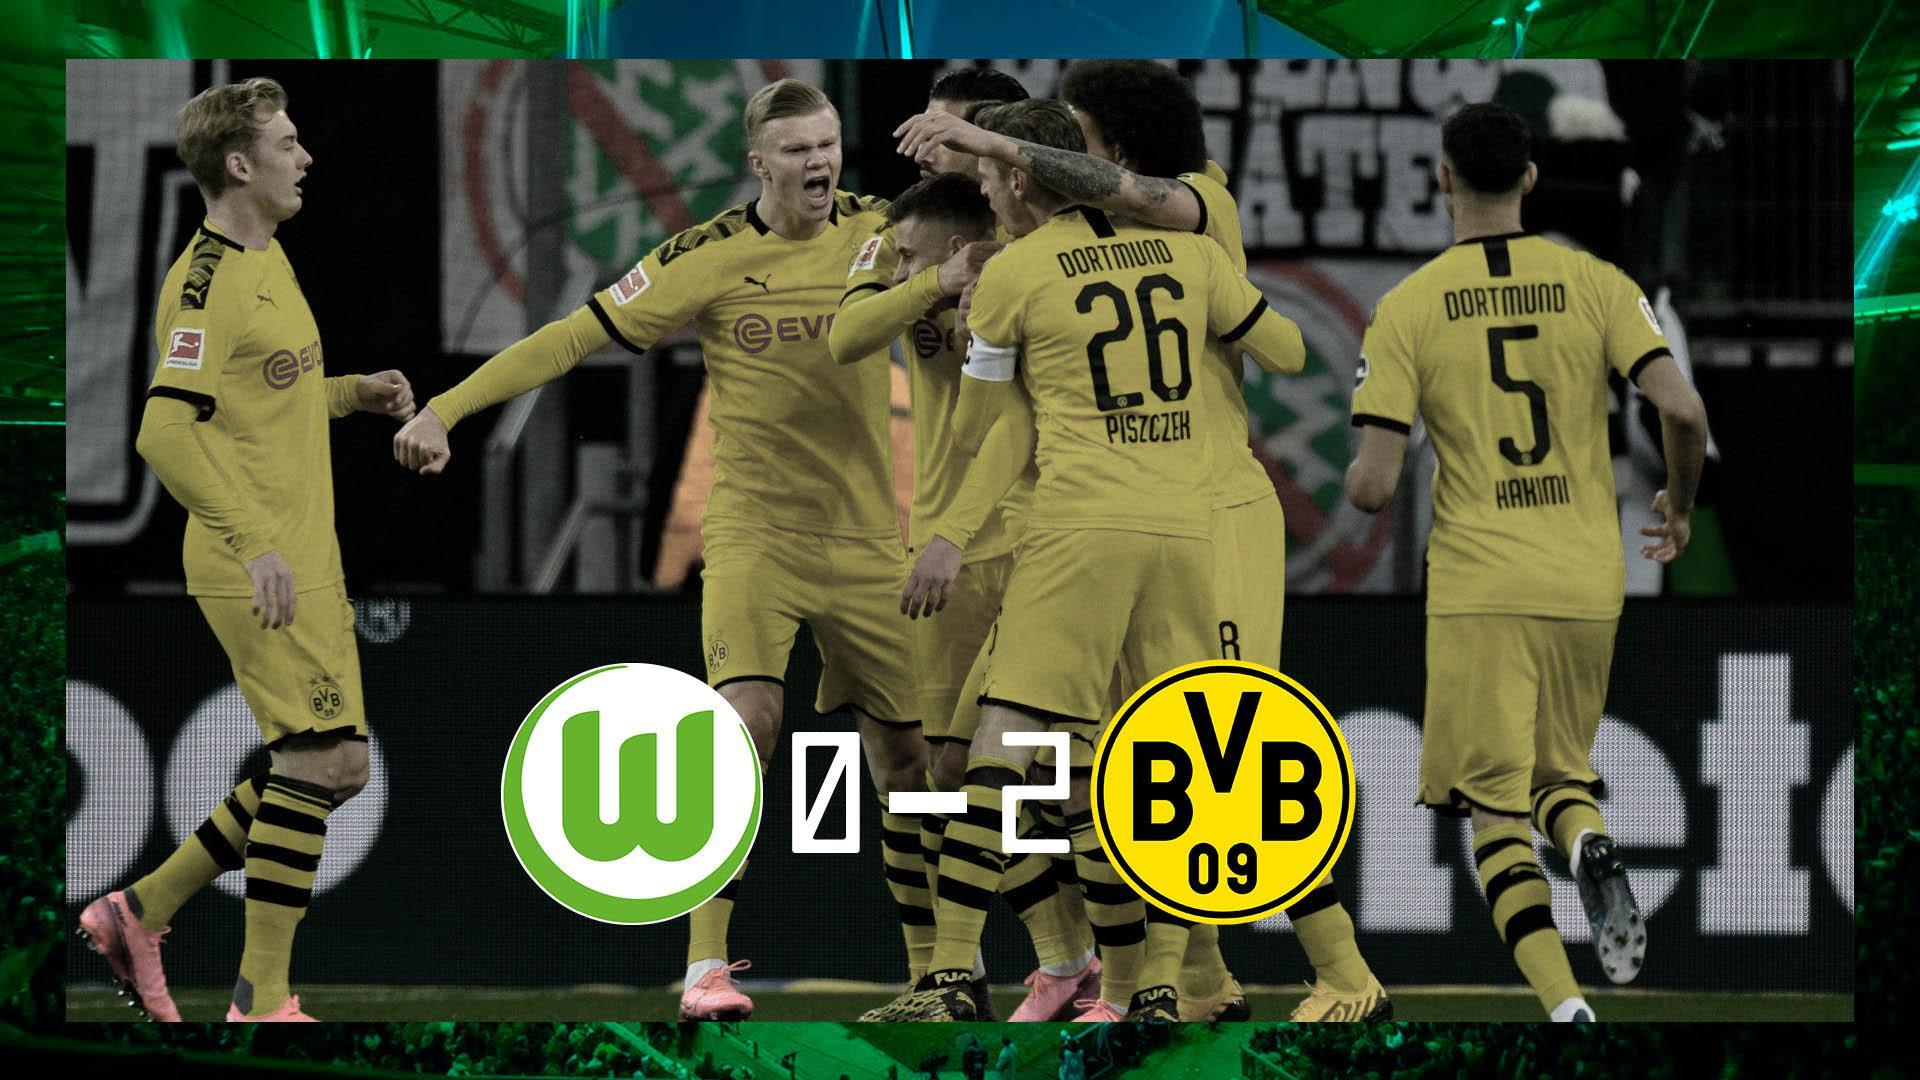 wolfsburg-dortmund-bundesliga-2019-20-match-report